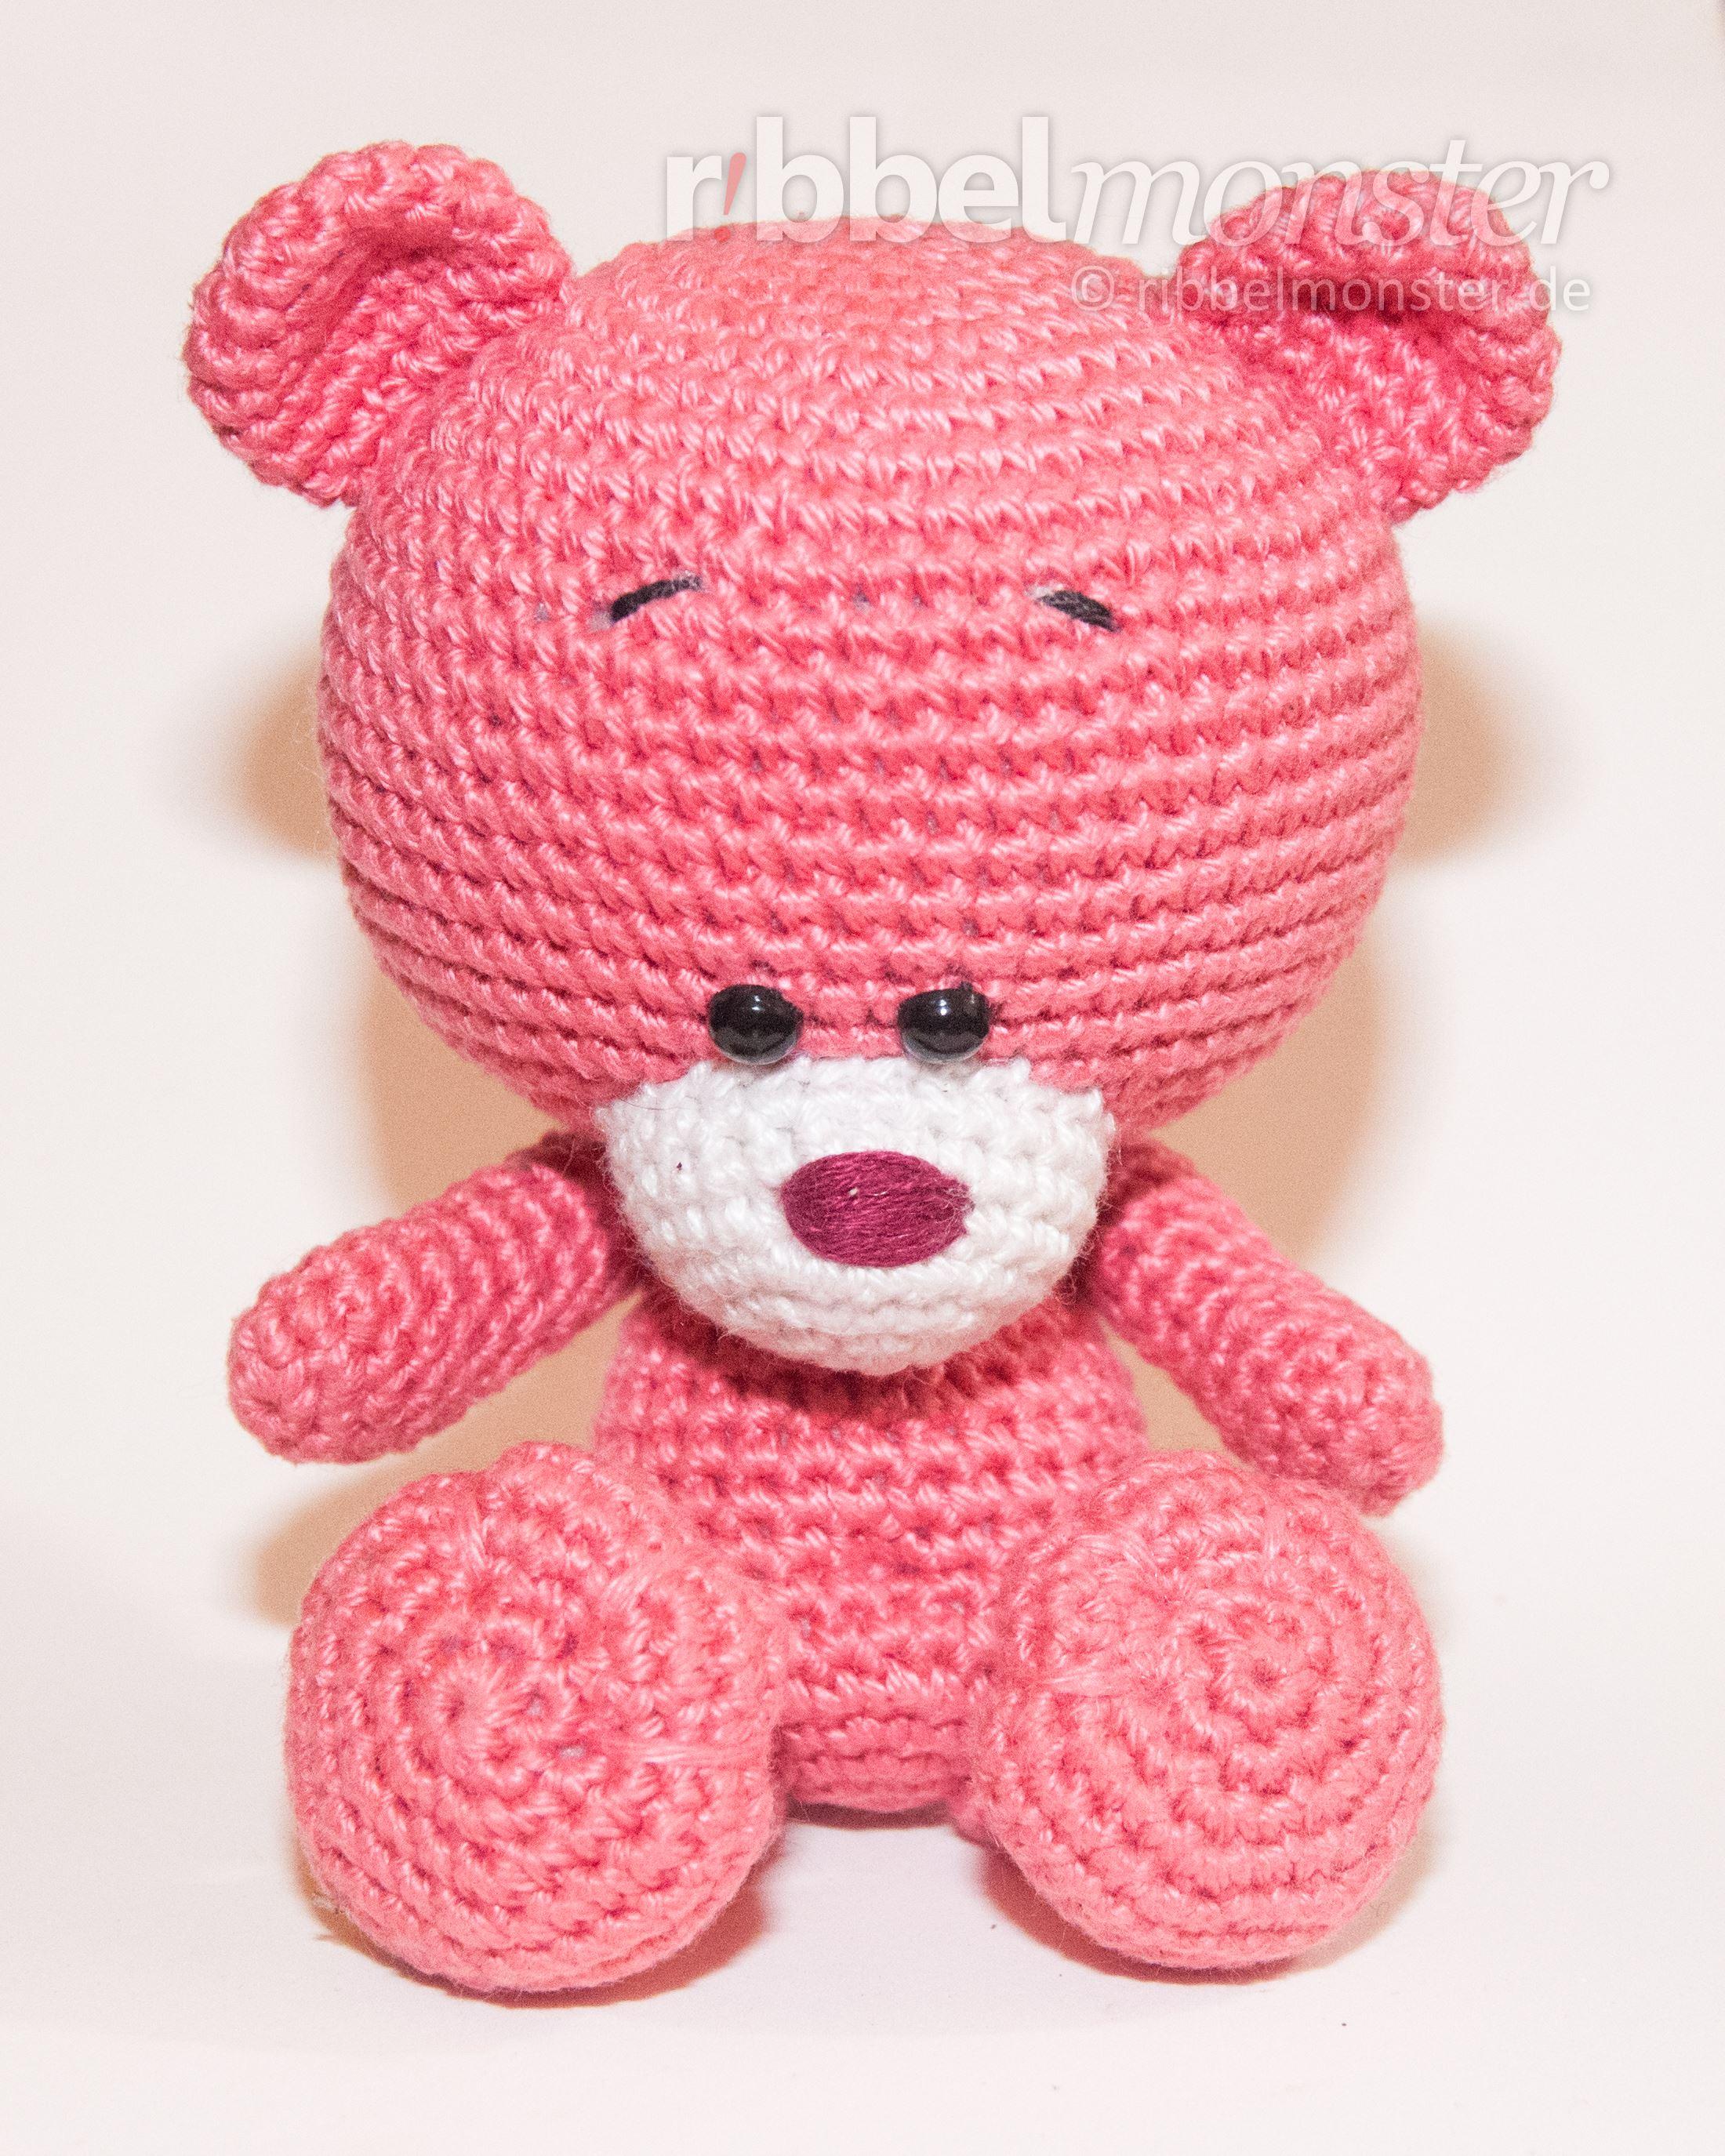 Amigurumi - Teddy hakeln